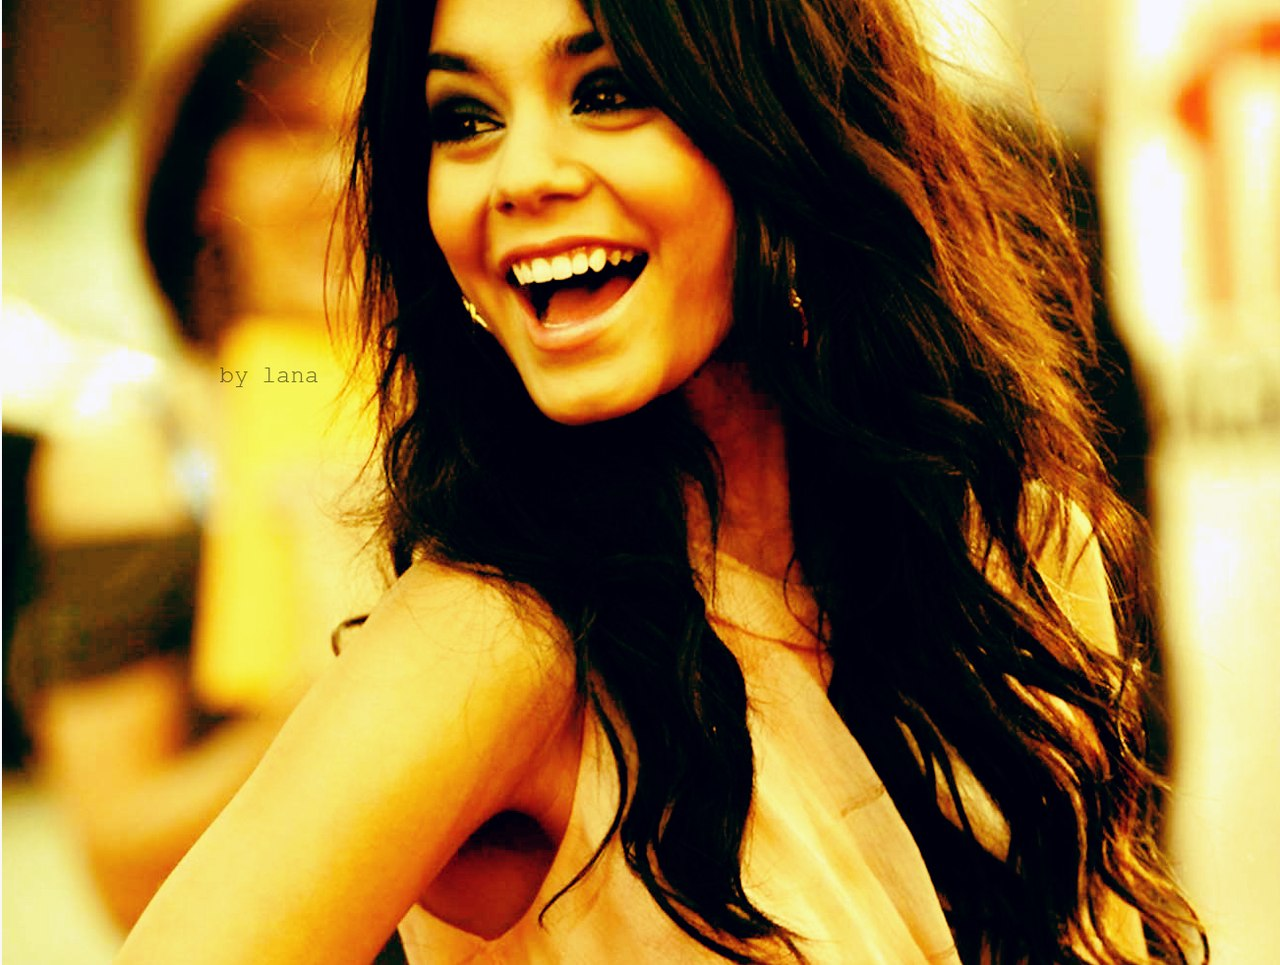 Фото на аву улыбающийся девушки